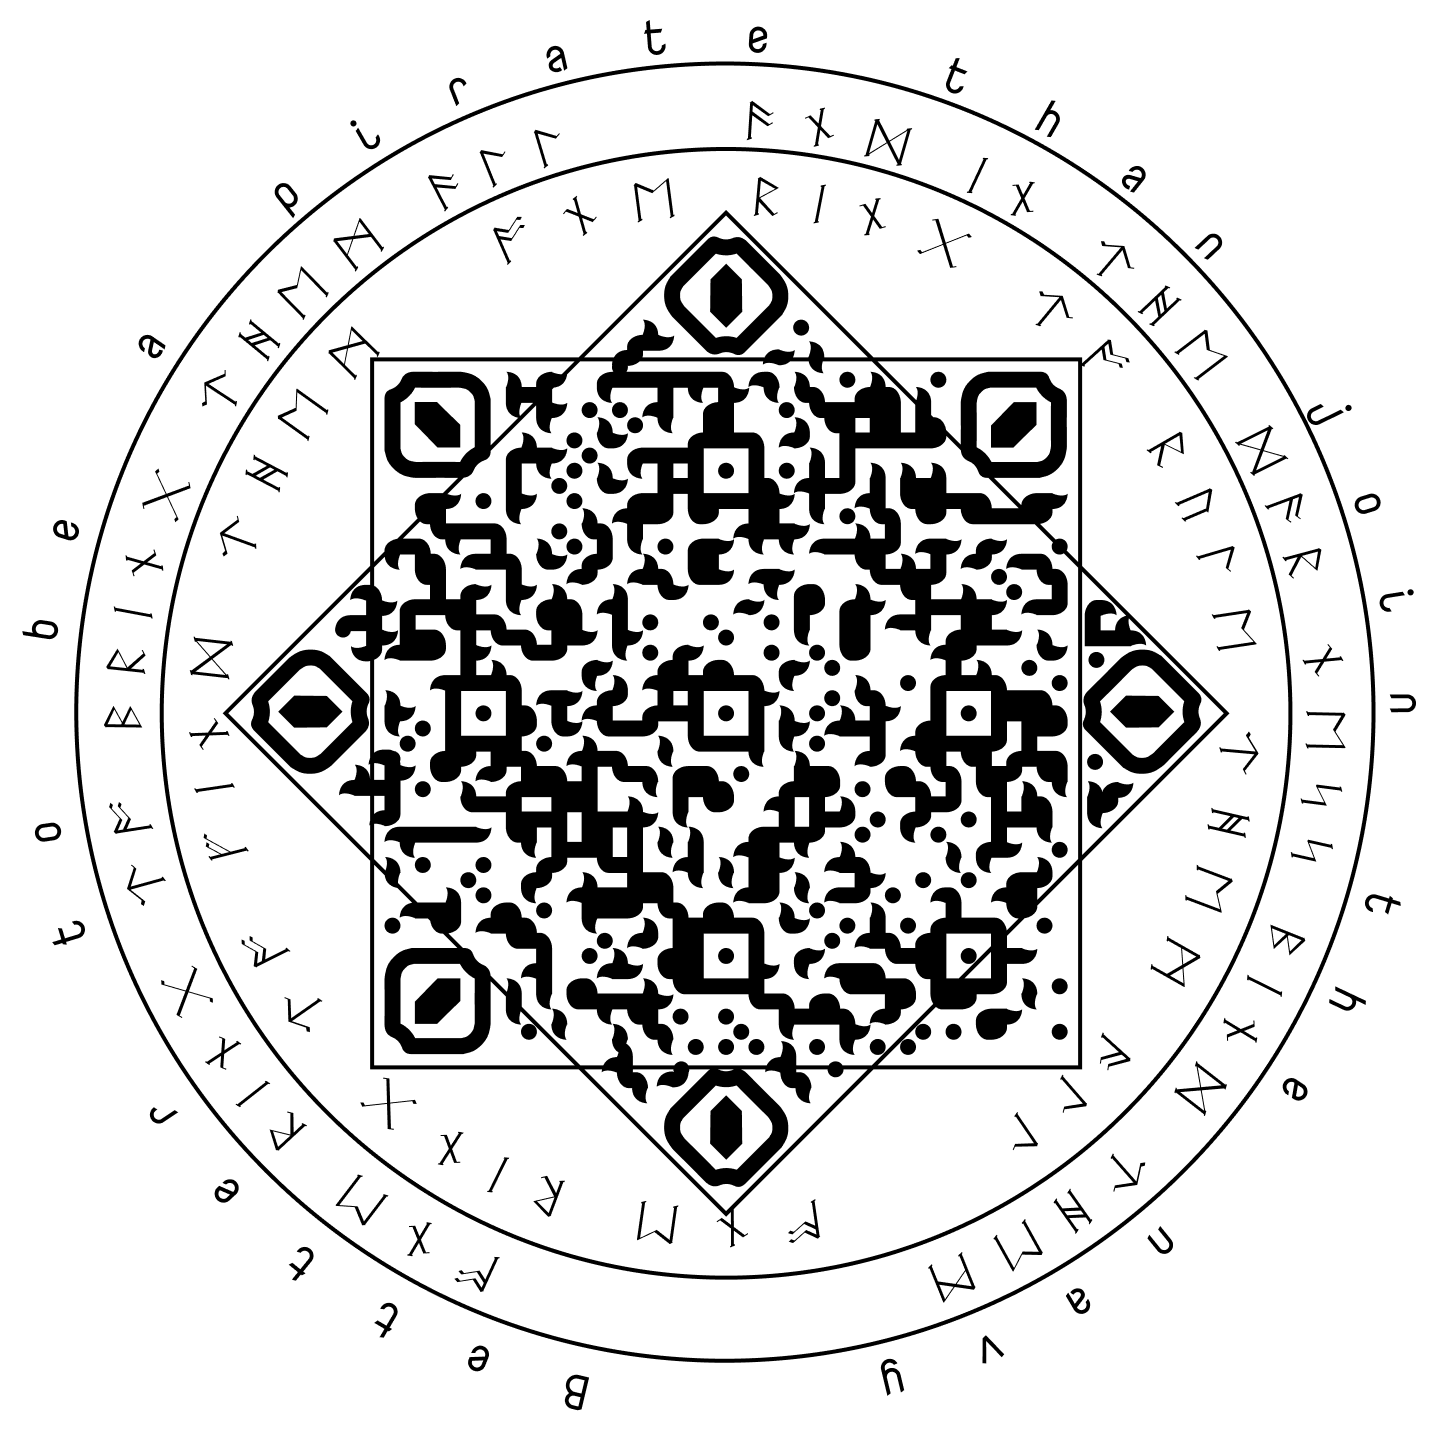 https://cloud-35l0ixapv.vercel.app/0wifi.png